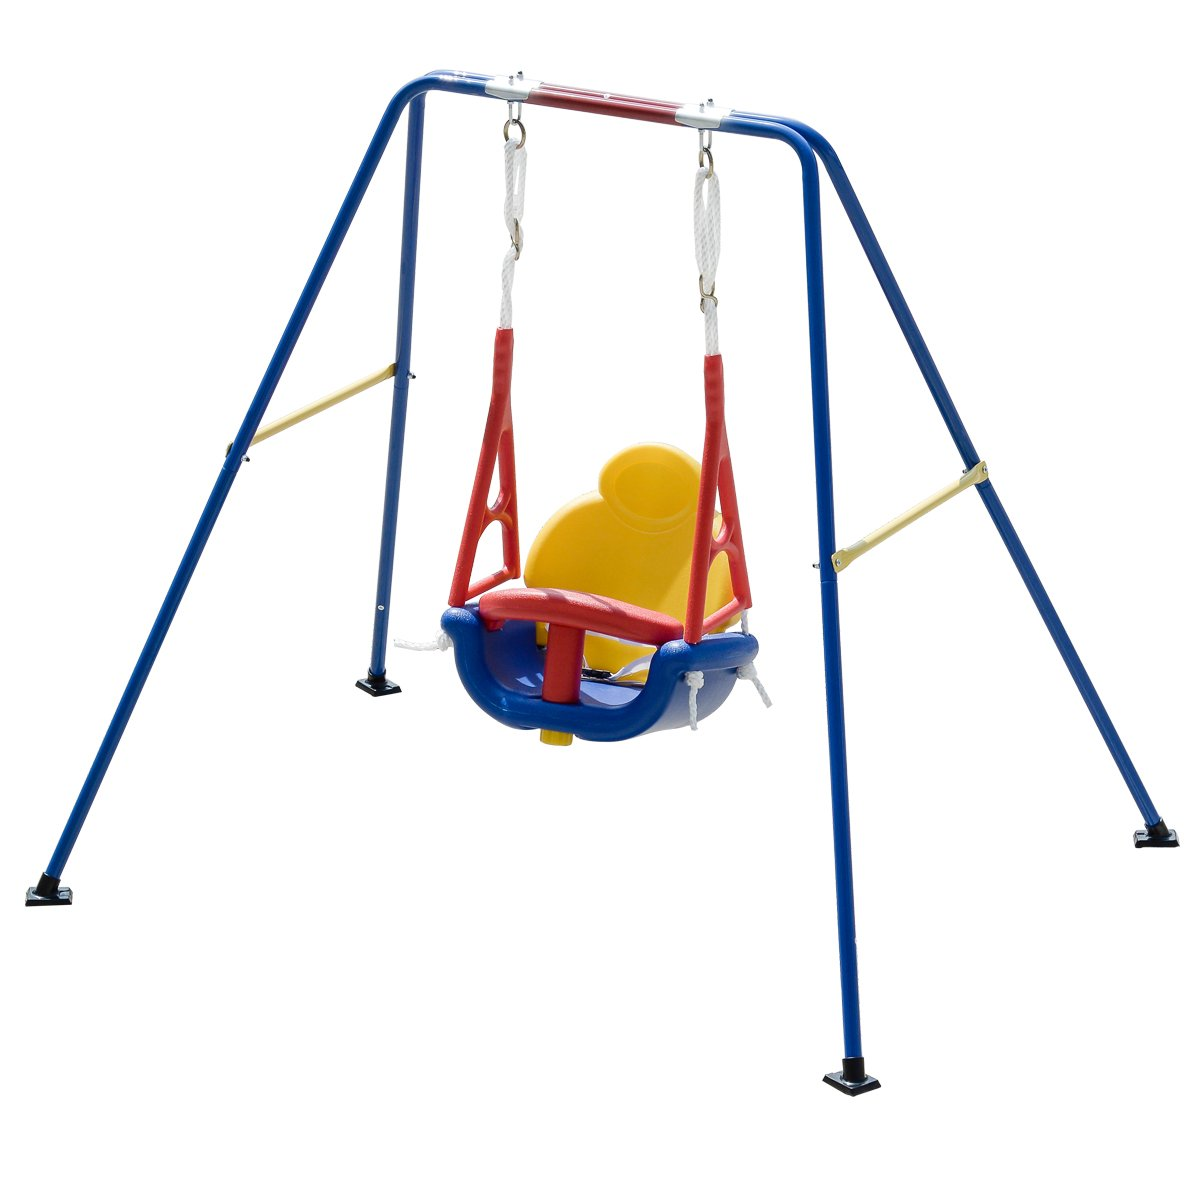 Cheap Climber Swing Set Find Climber Swing Set Deals On Line At